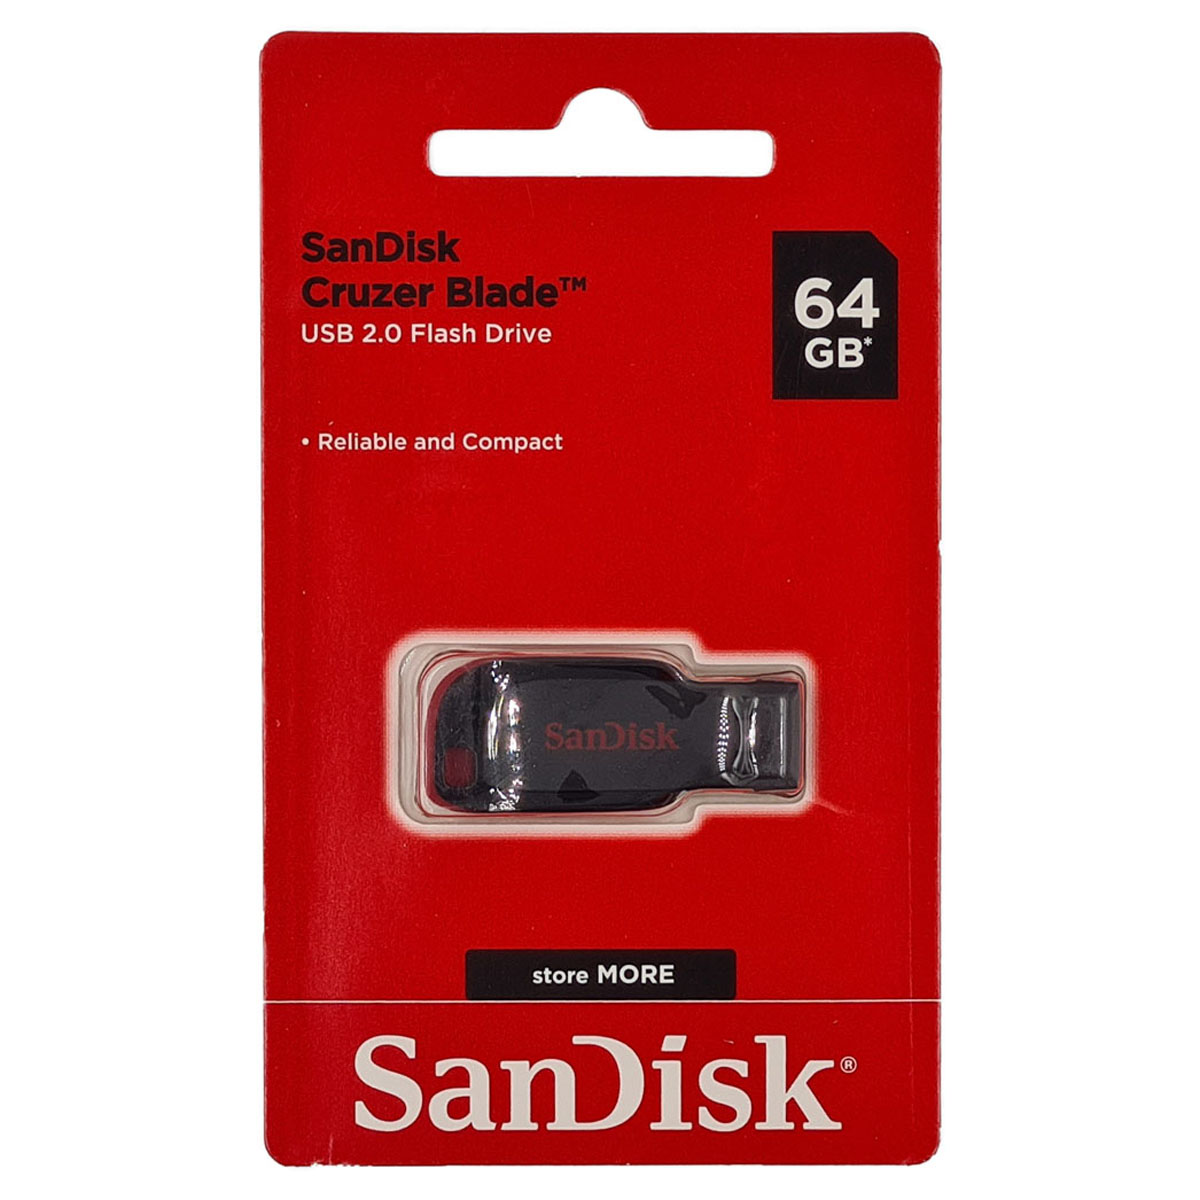 Pen Drive Cruzer Blade 64GB USB 2.0 B35 Sandisk